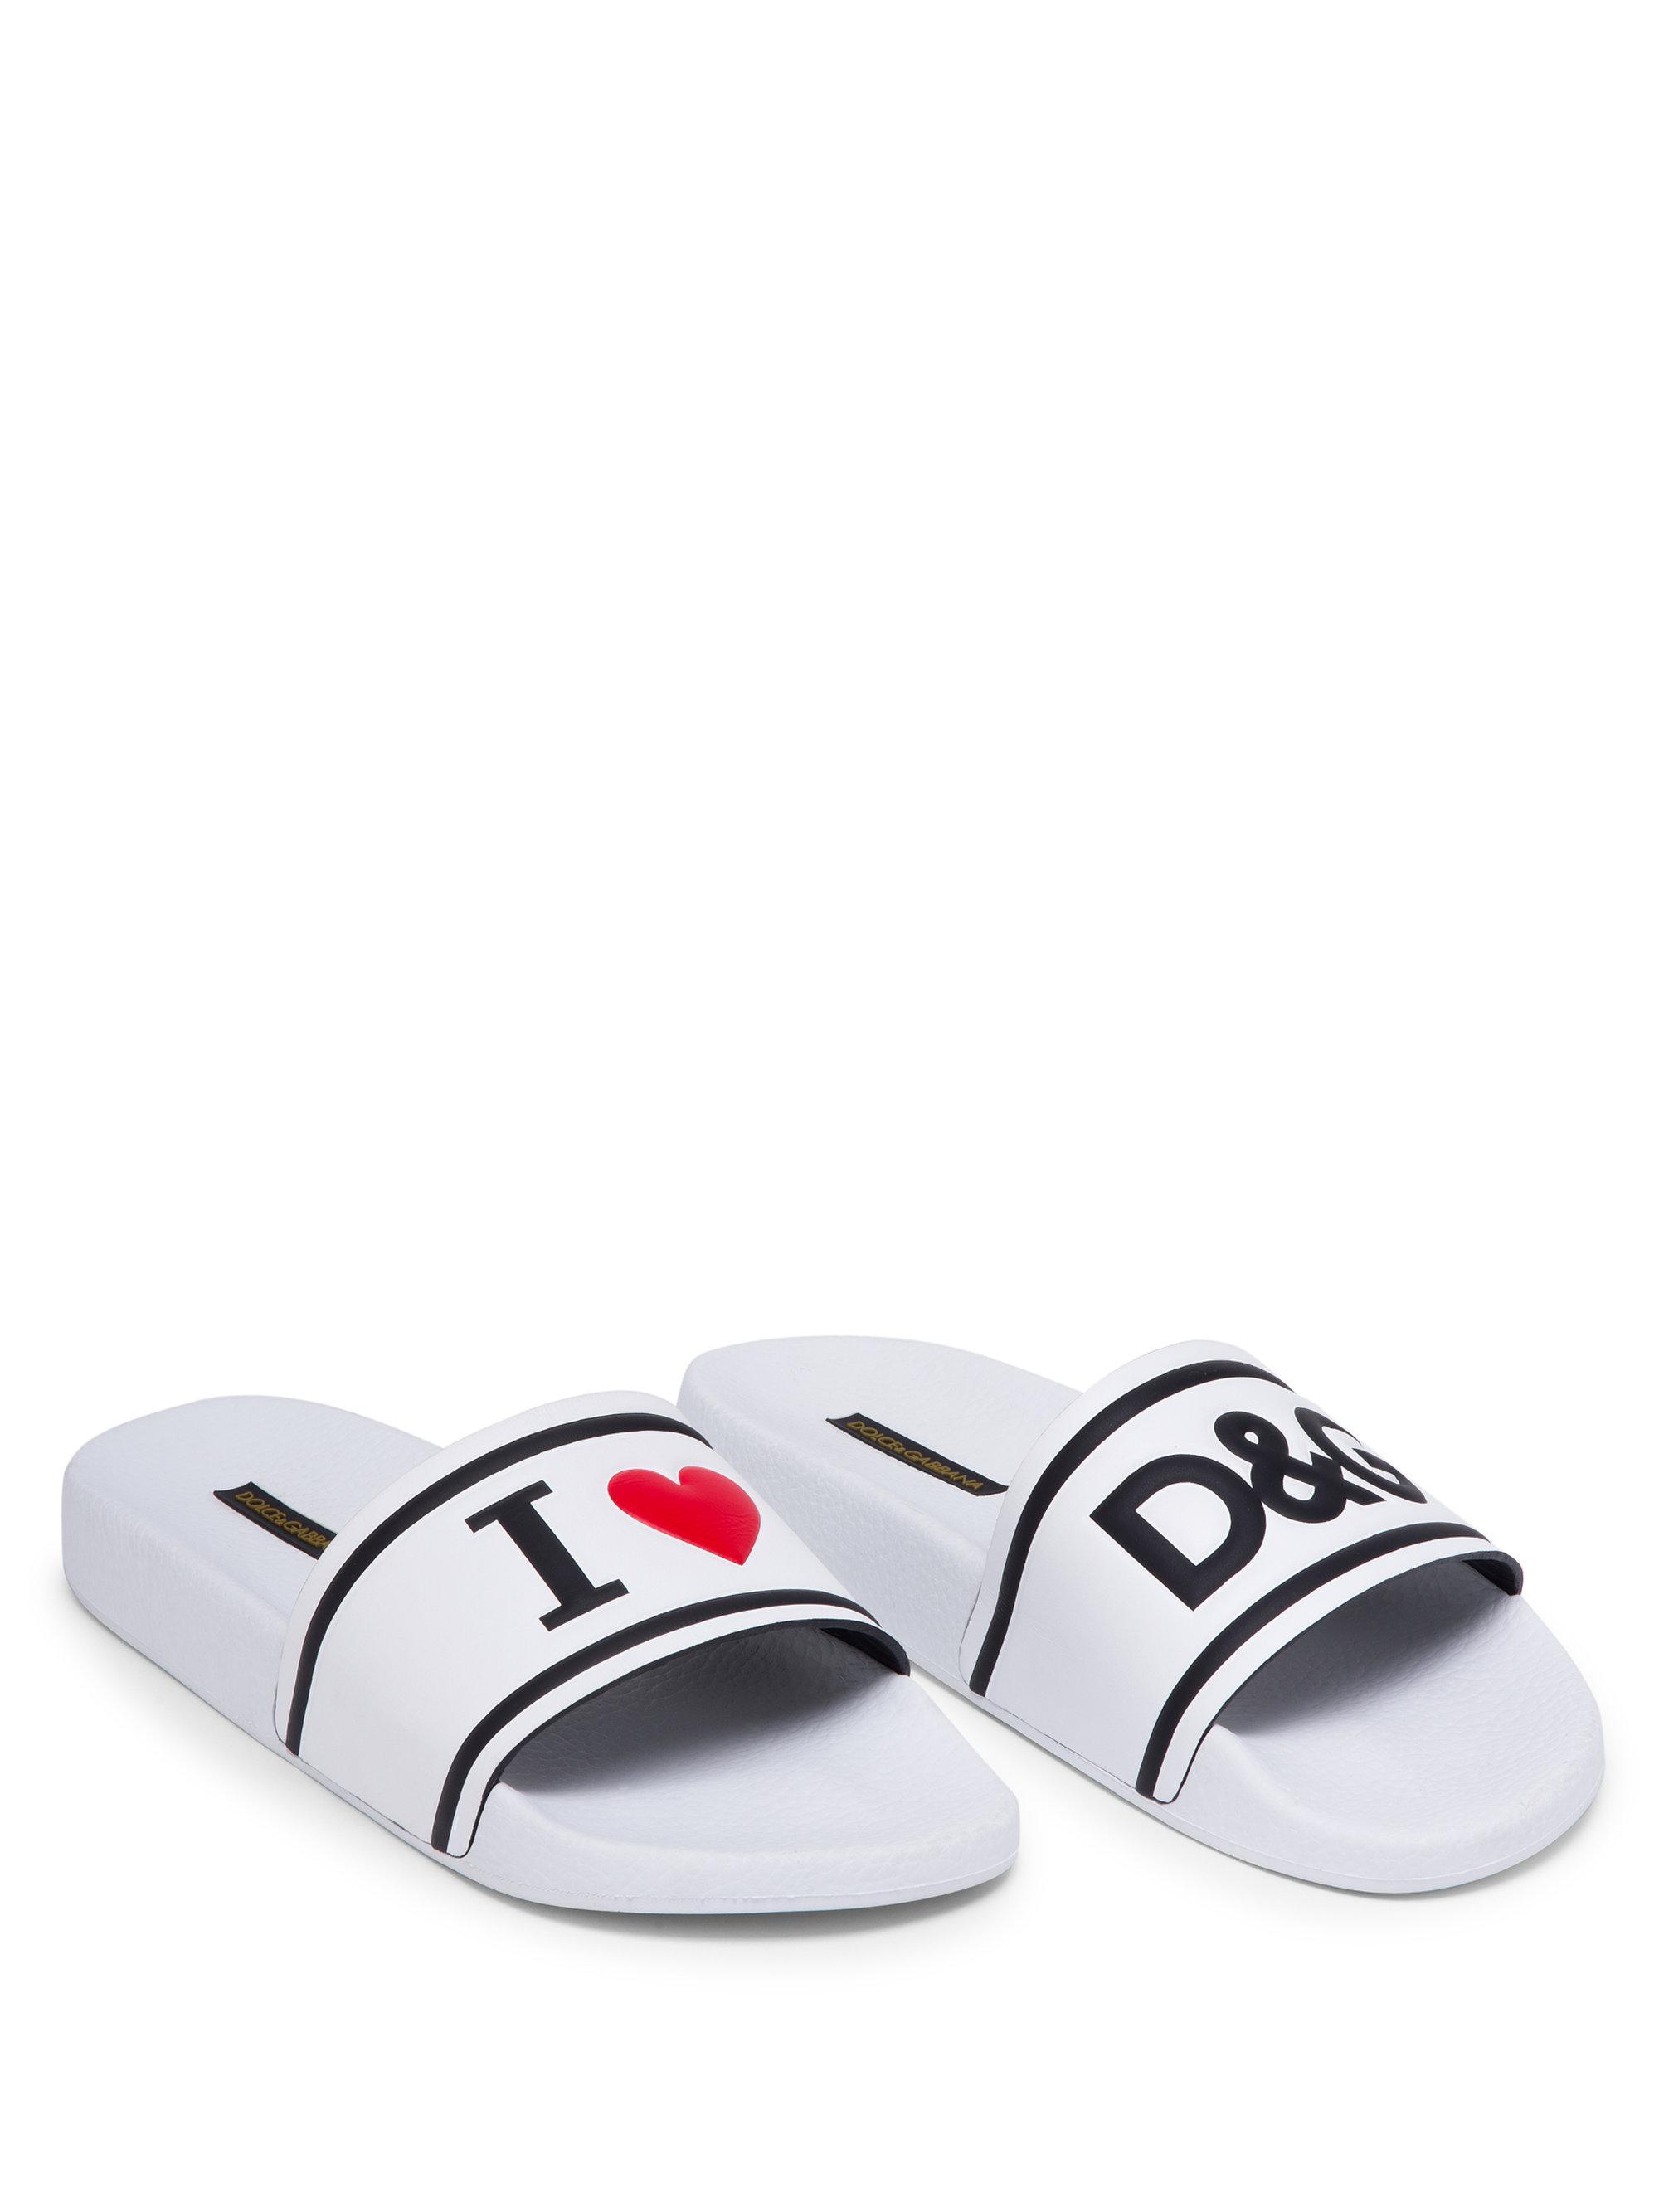 Dolce & Gabbana Love Leather Slides se7VaSpAm